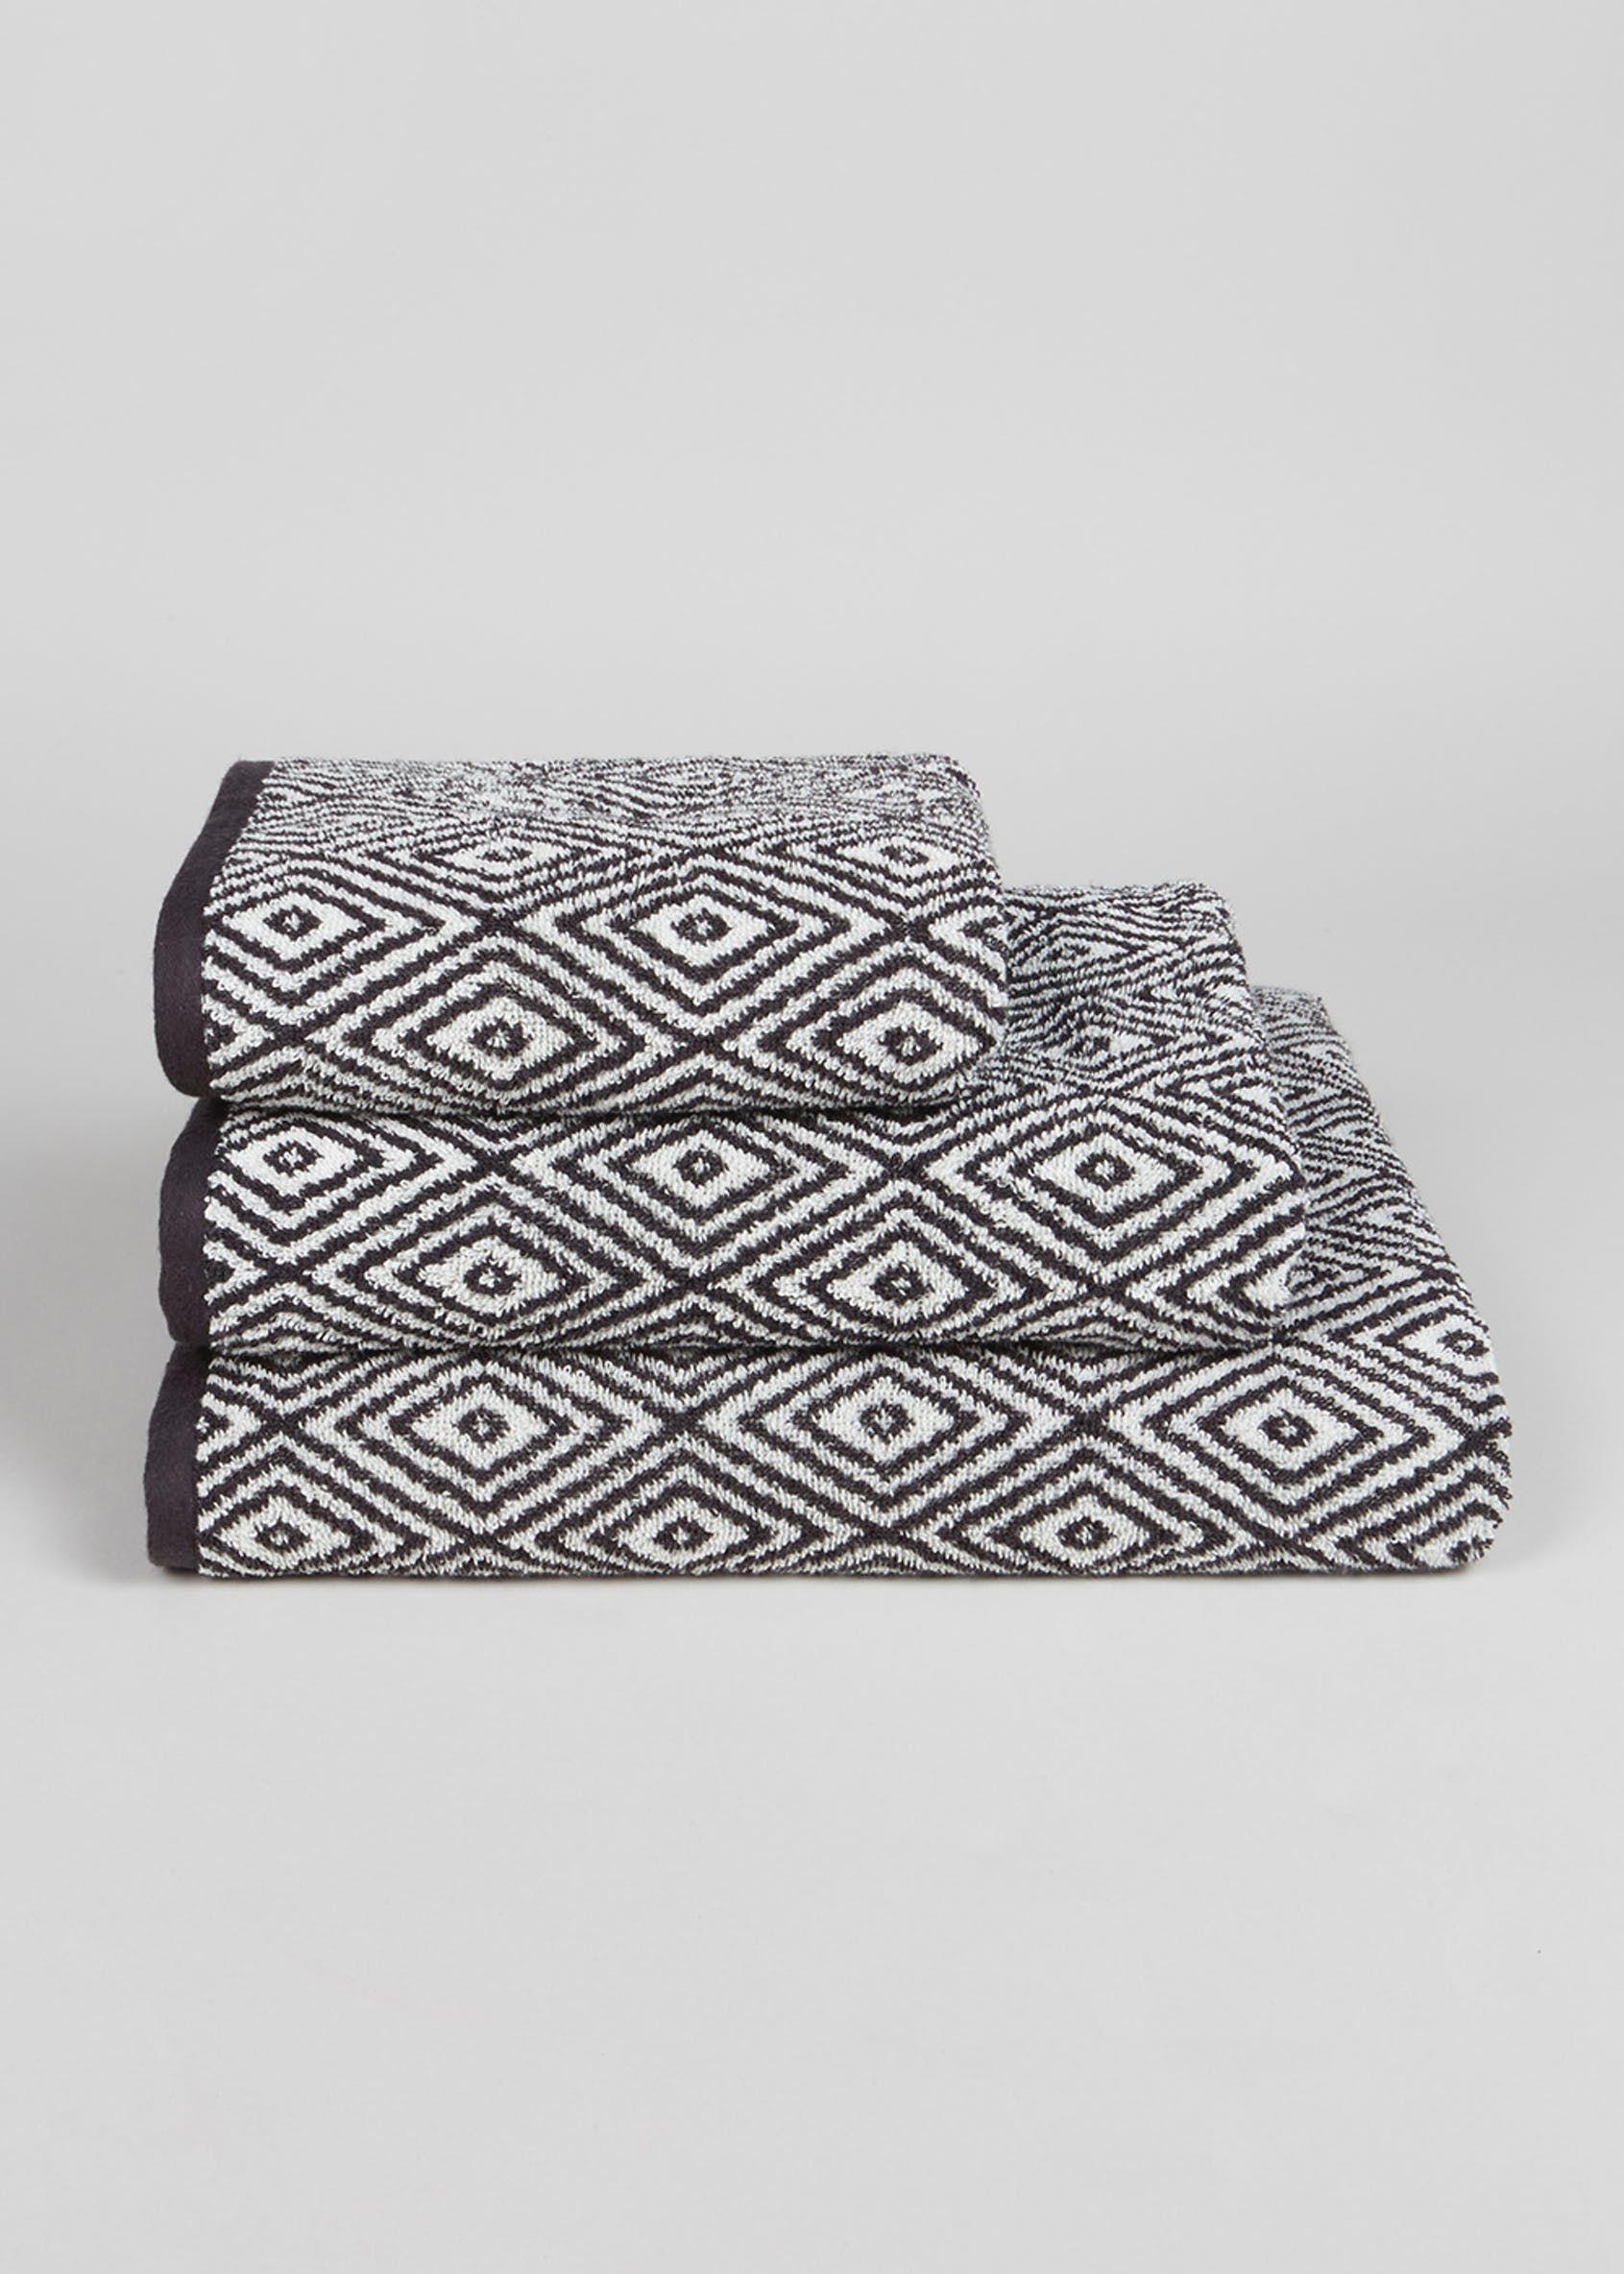 100 Cotton Geometric Pattern Towels Black Towel Pattern Black And White Towels Geometric Towel